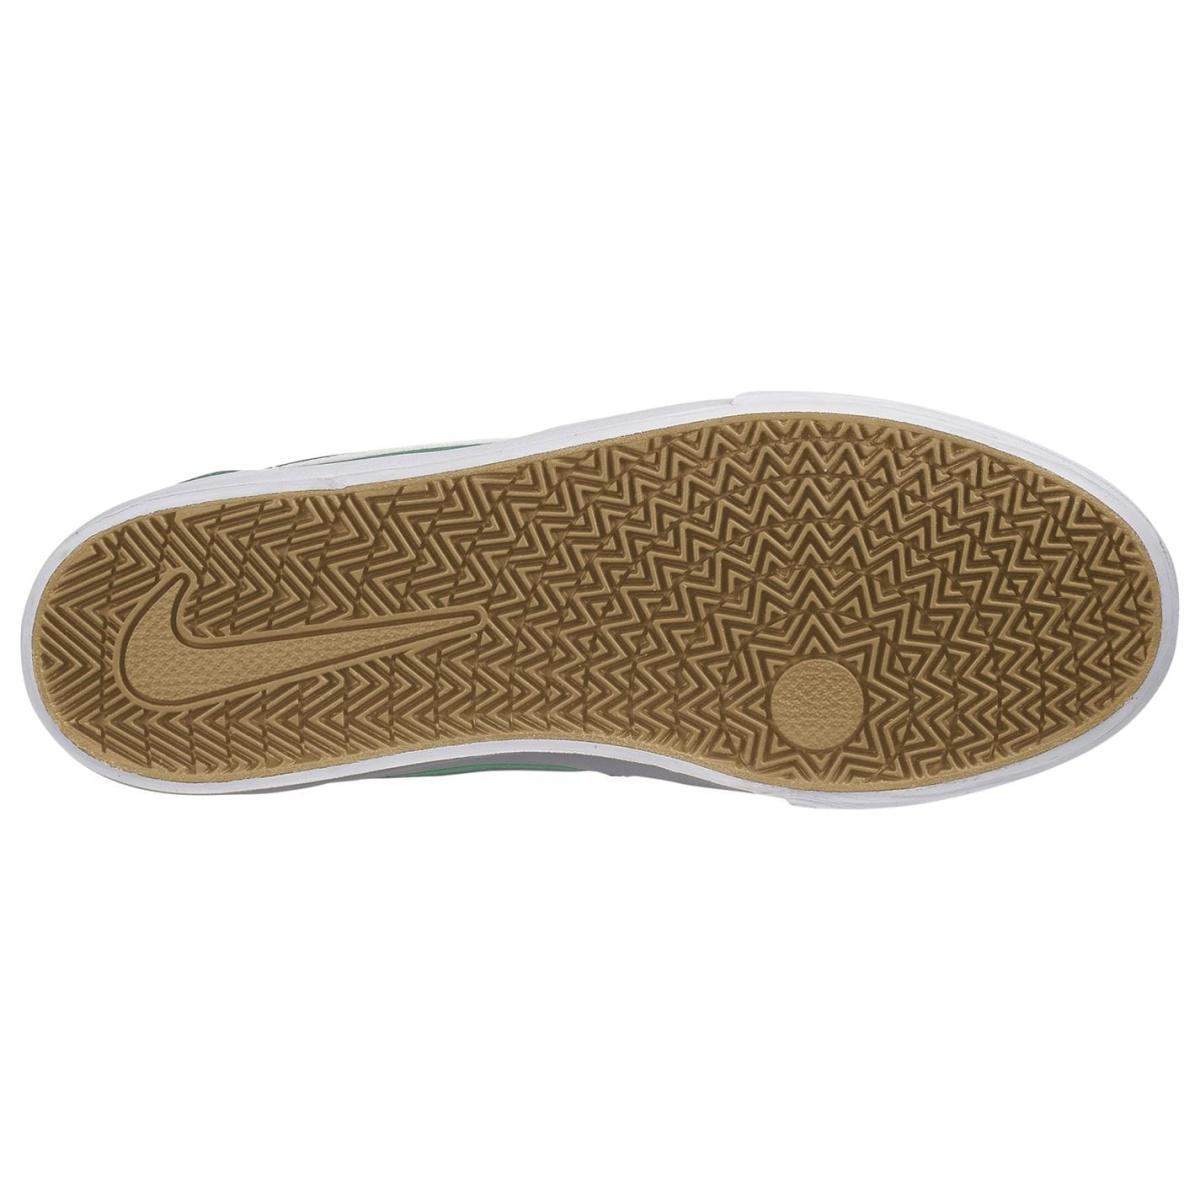 Nike-SB-Lot-Solarsoft-Skate-Chaussures-Messieurs-Skater-Chaussures-De-Sport-Skate-2162 miniature 52